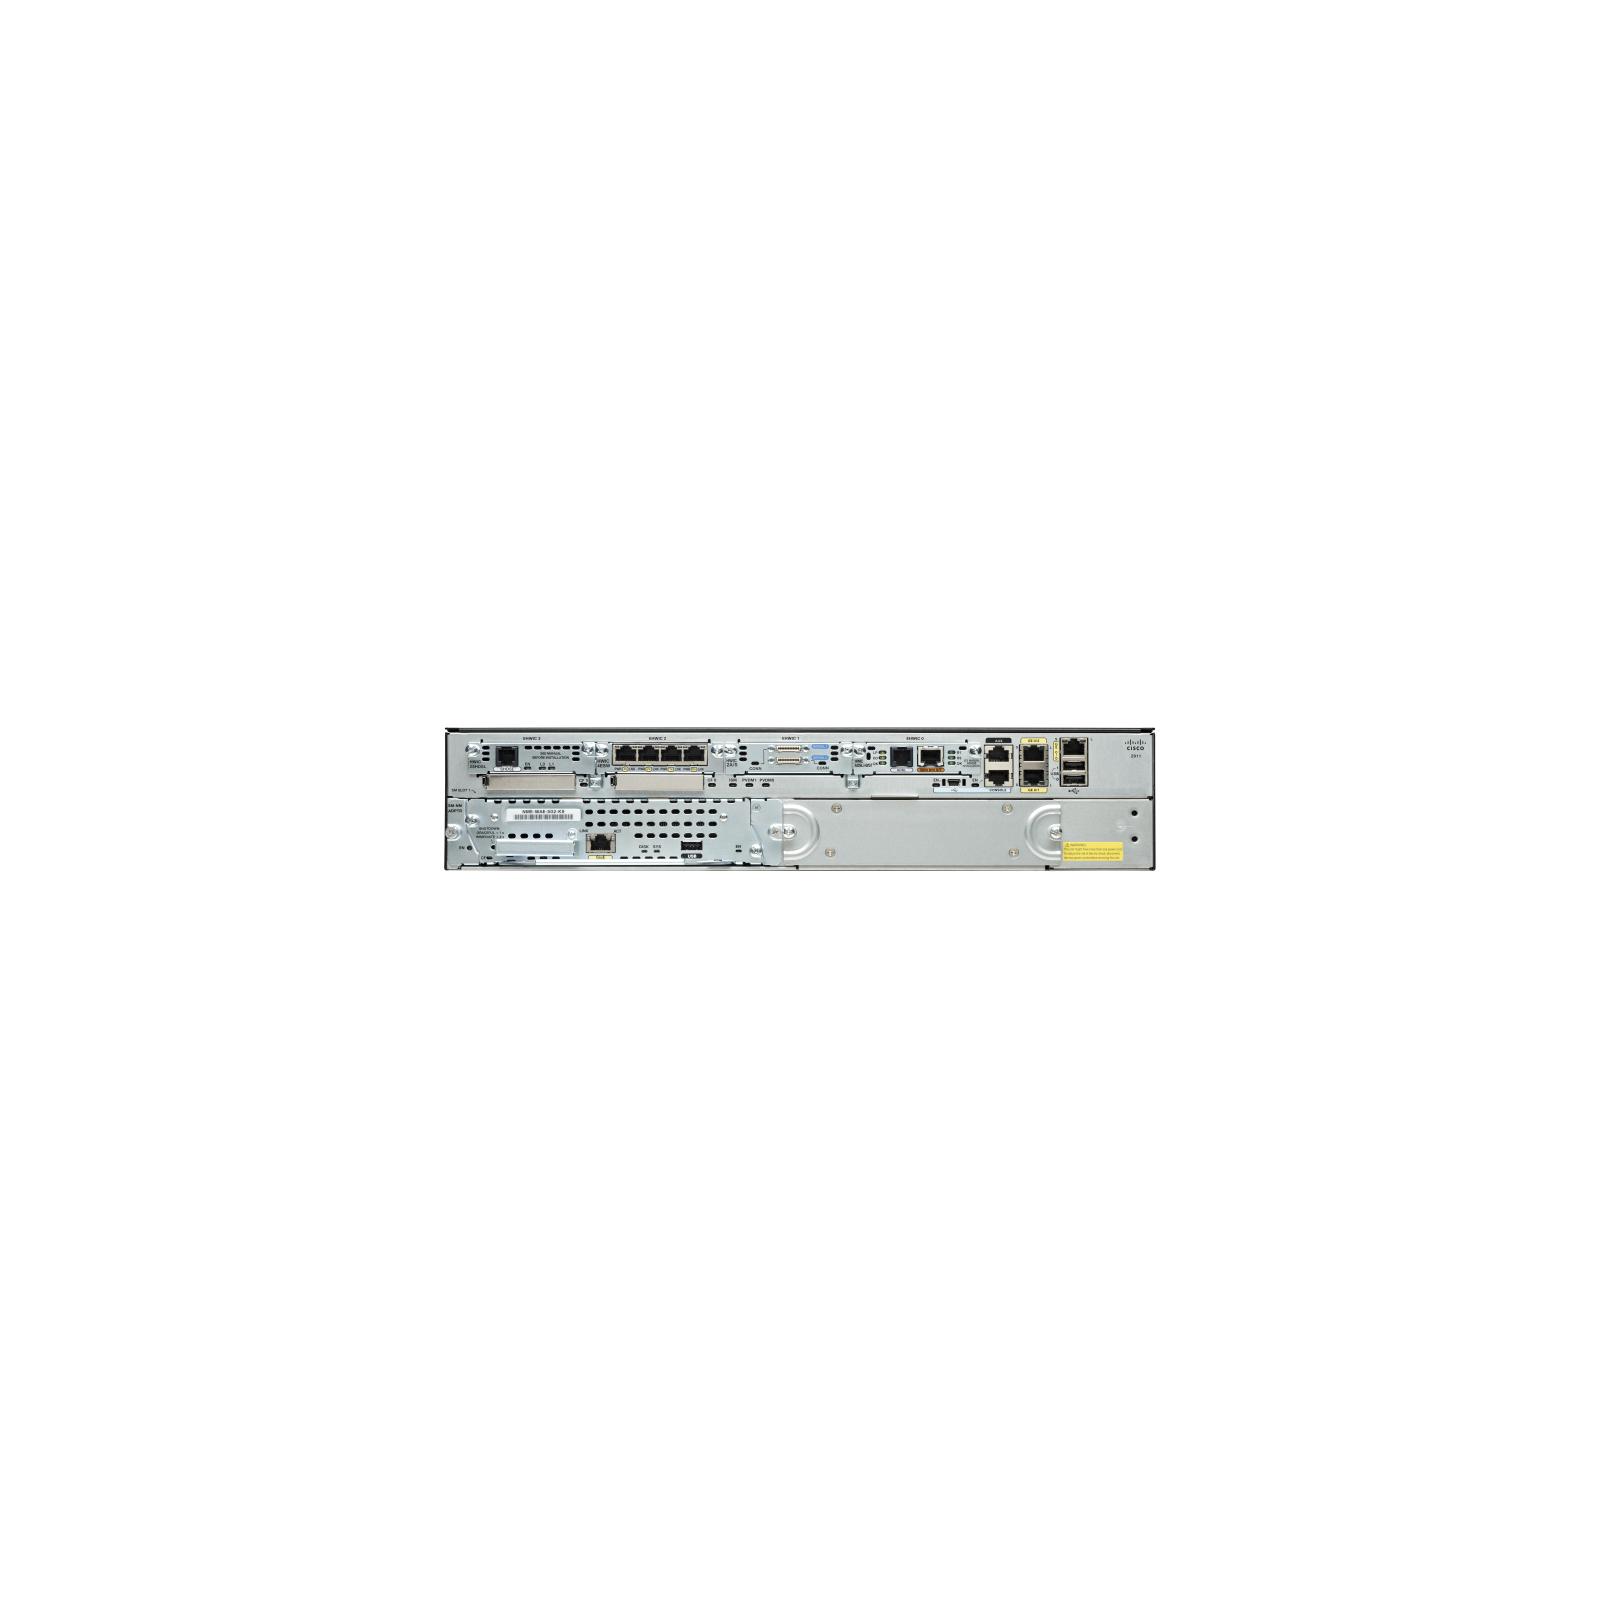 Маршрутизатор Cisco CISCO2911/K9 изображение 2